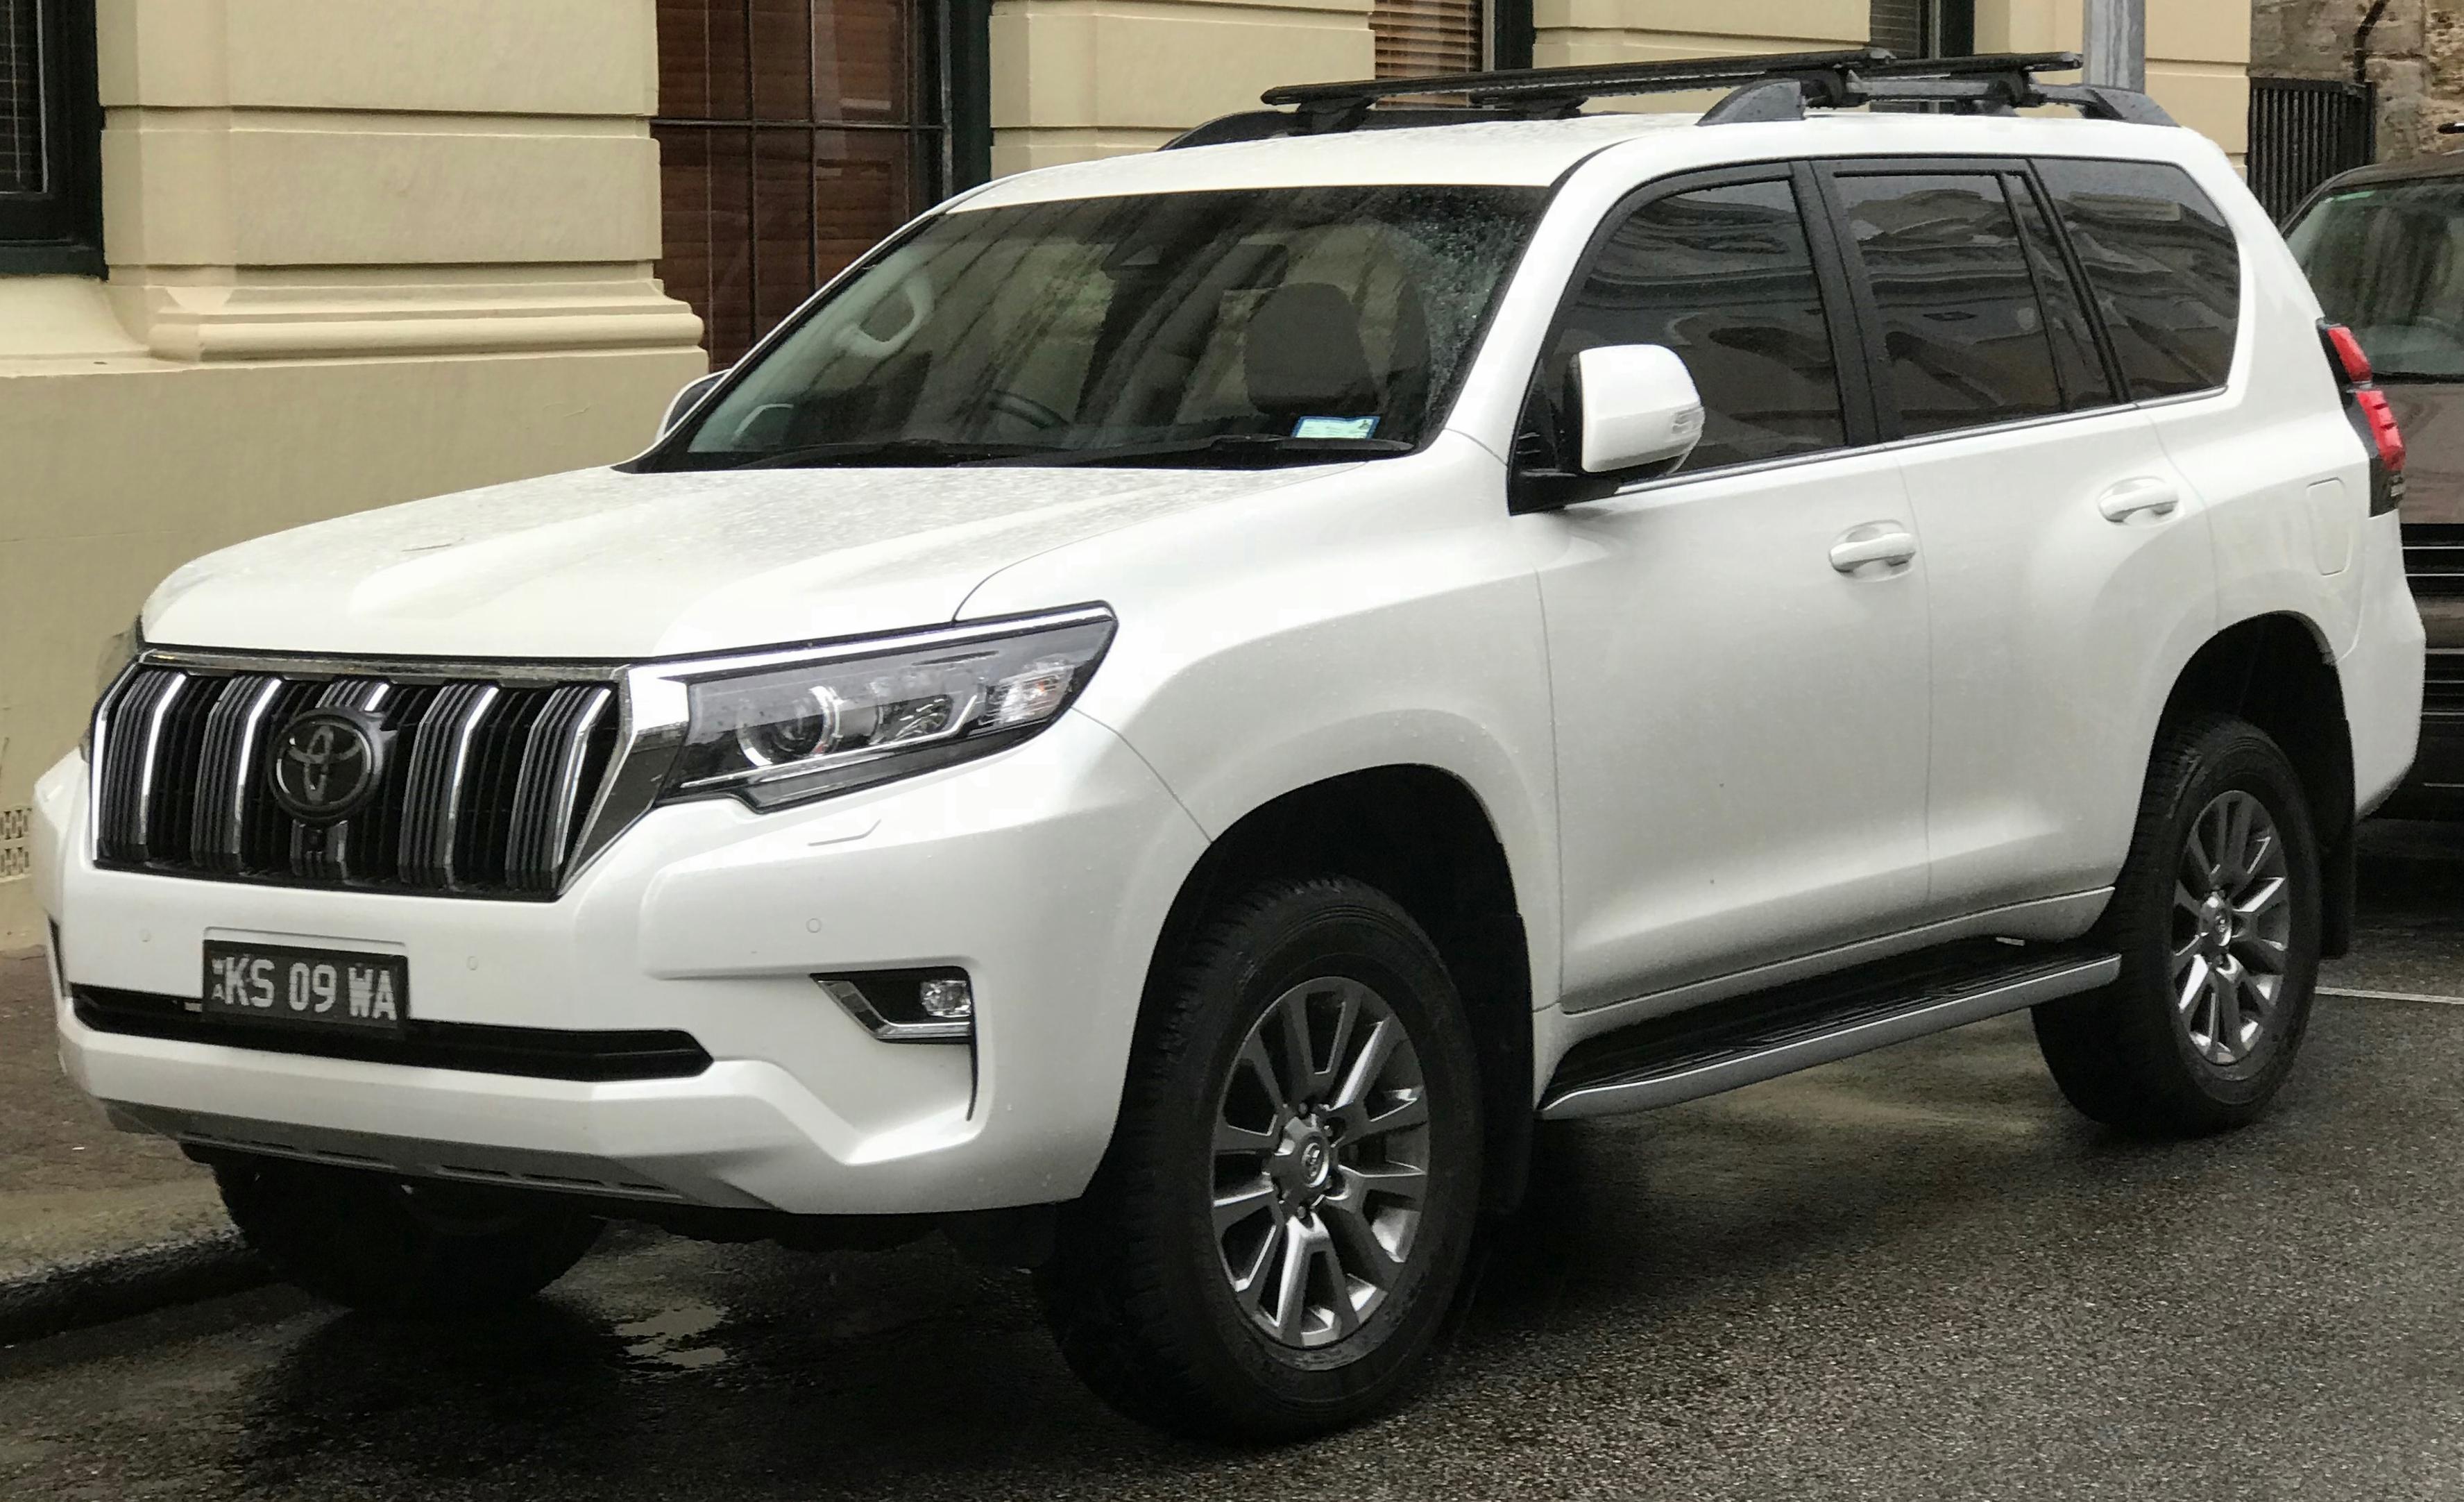 File:2018 Toyota Land Cruiser Prado (GDJ150R) VX 4WD wagon (2018-